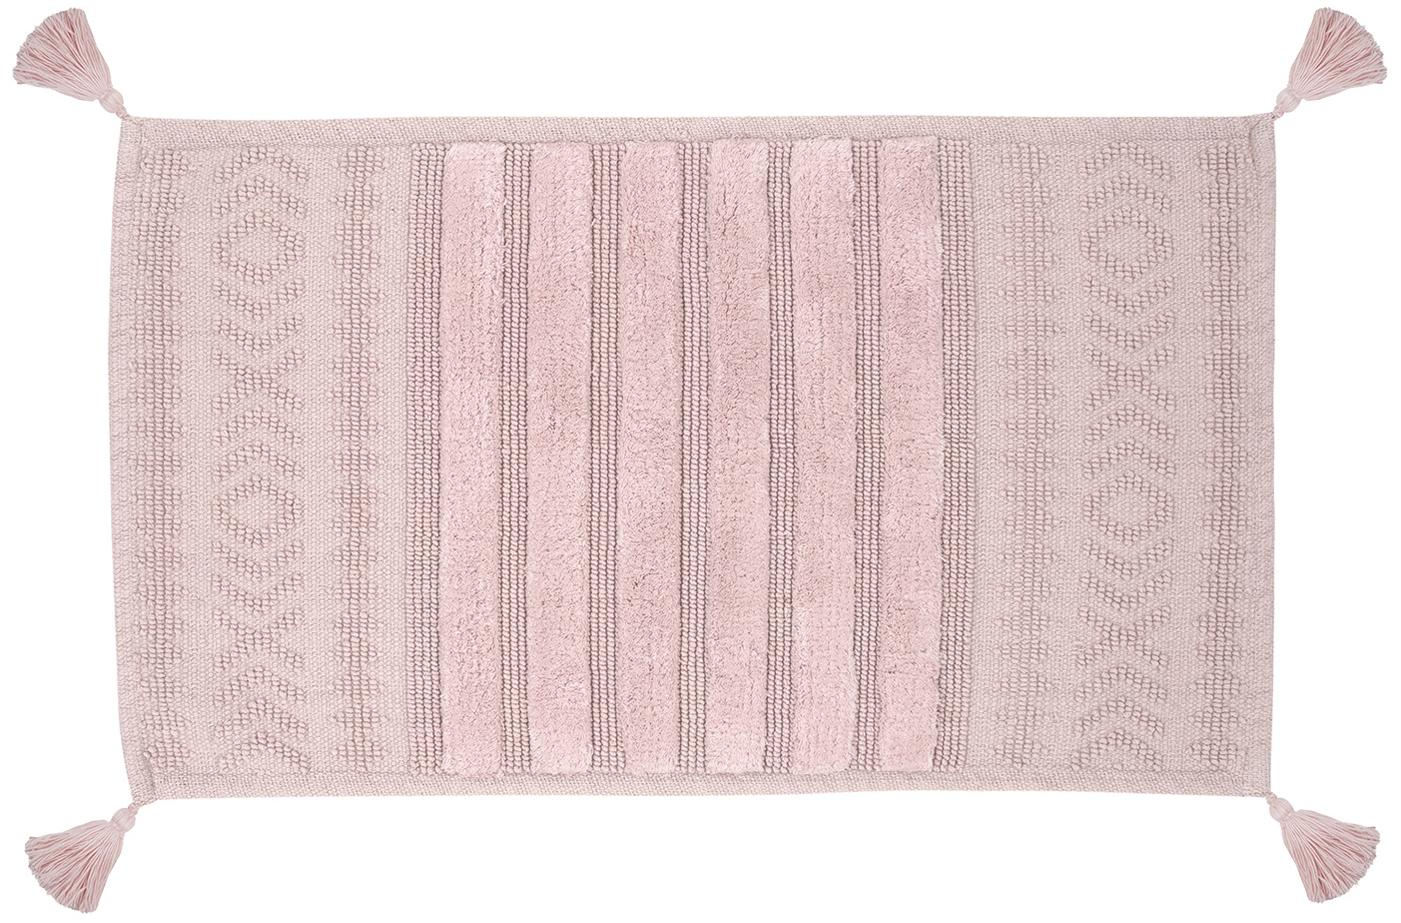 Alfombrilla de baño con borlas Bernadotte, Rosa palo, An 50 x L 80 cm